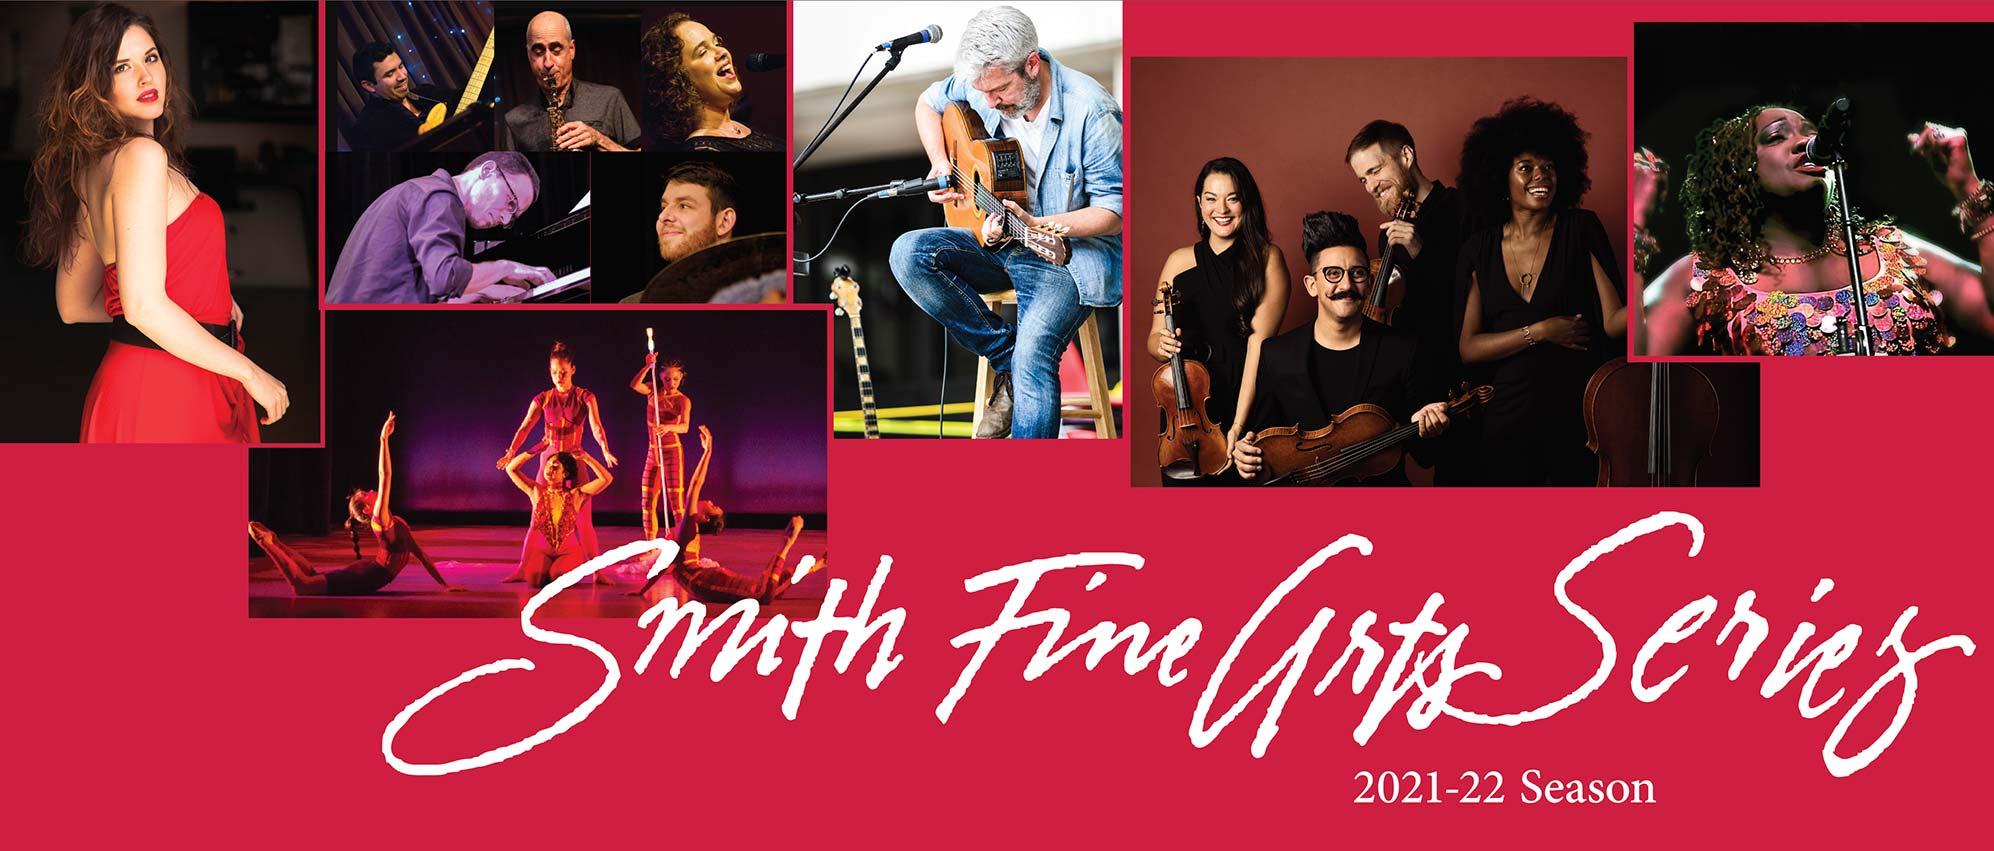 Smith Fine Arts Series photos